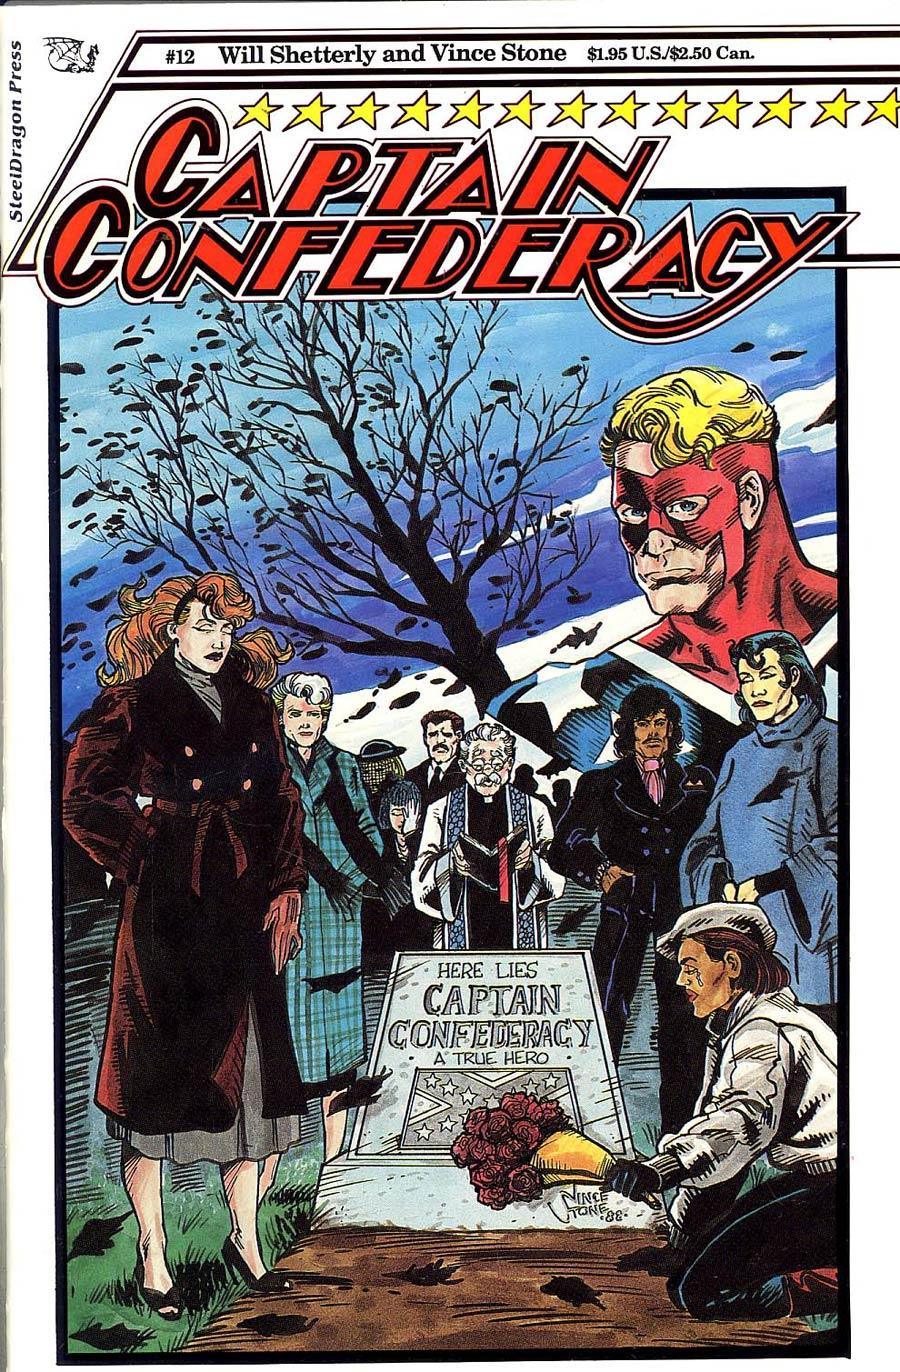 Captain Confederacy #12